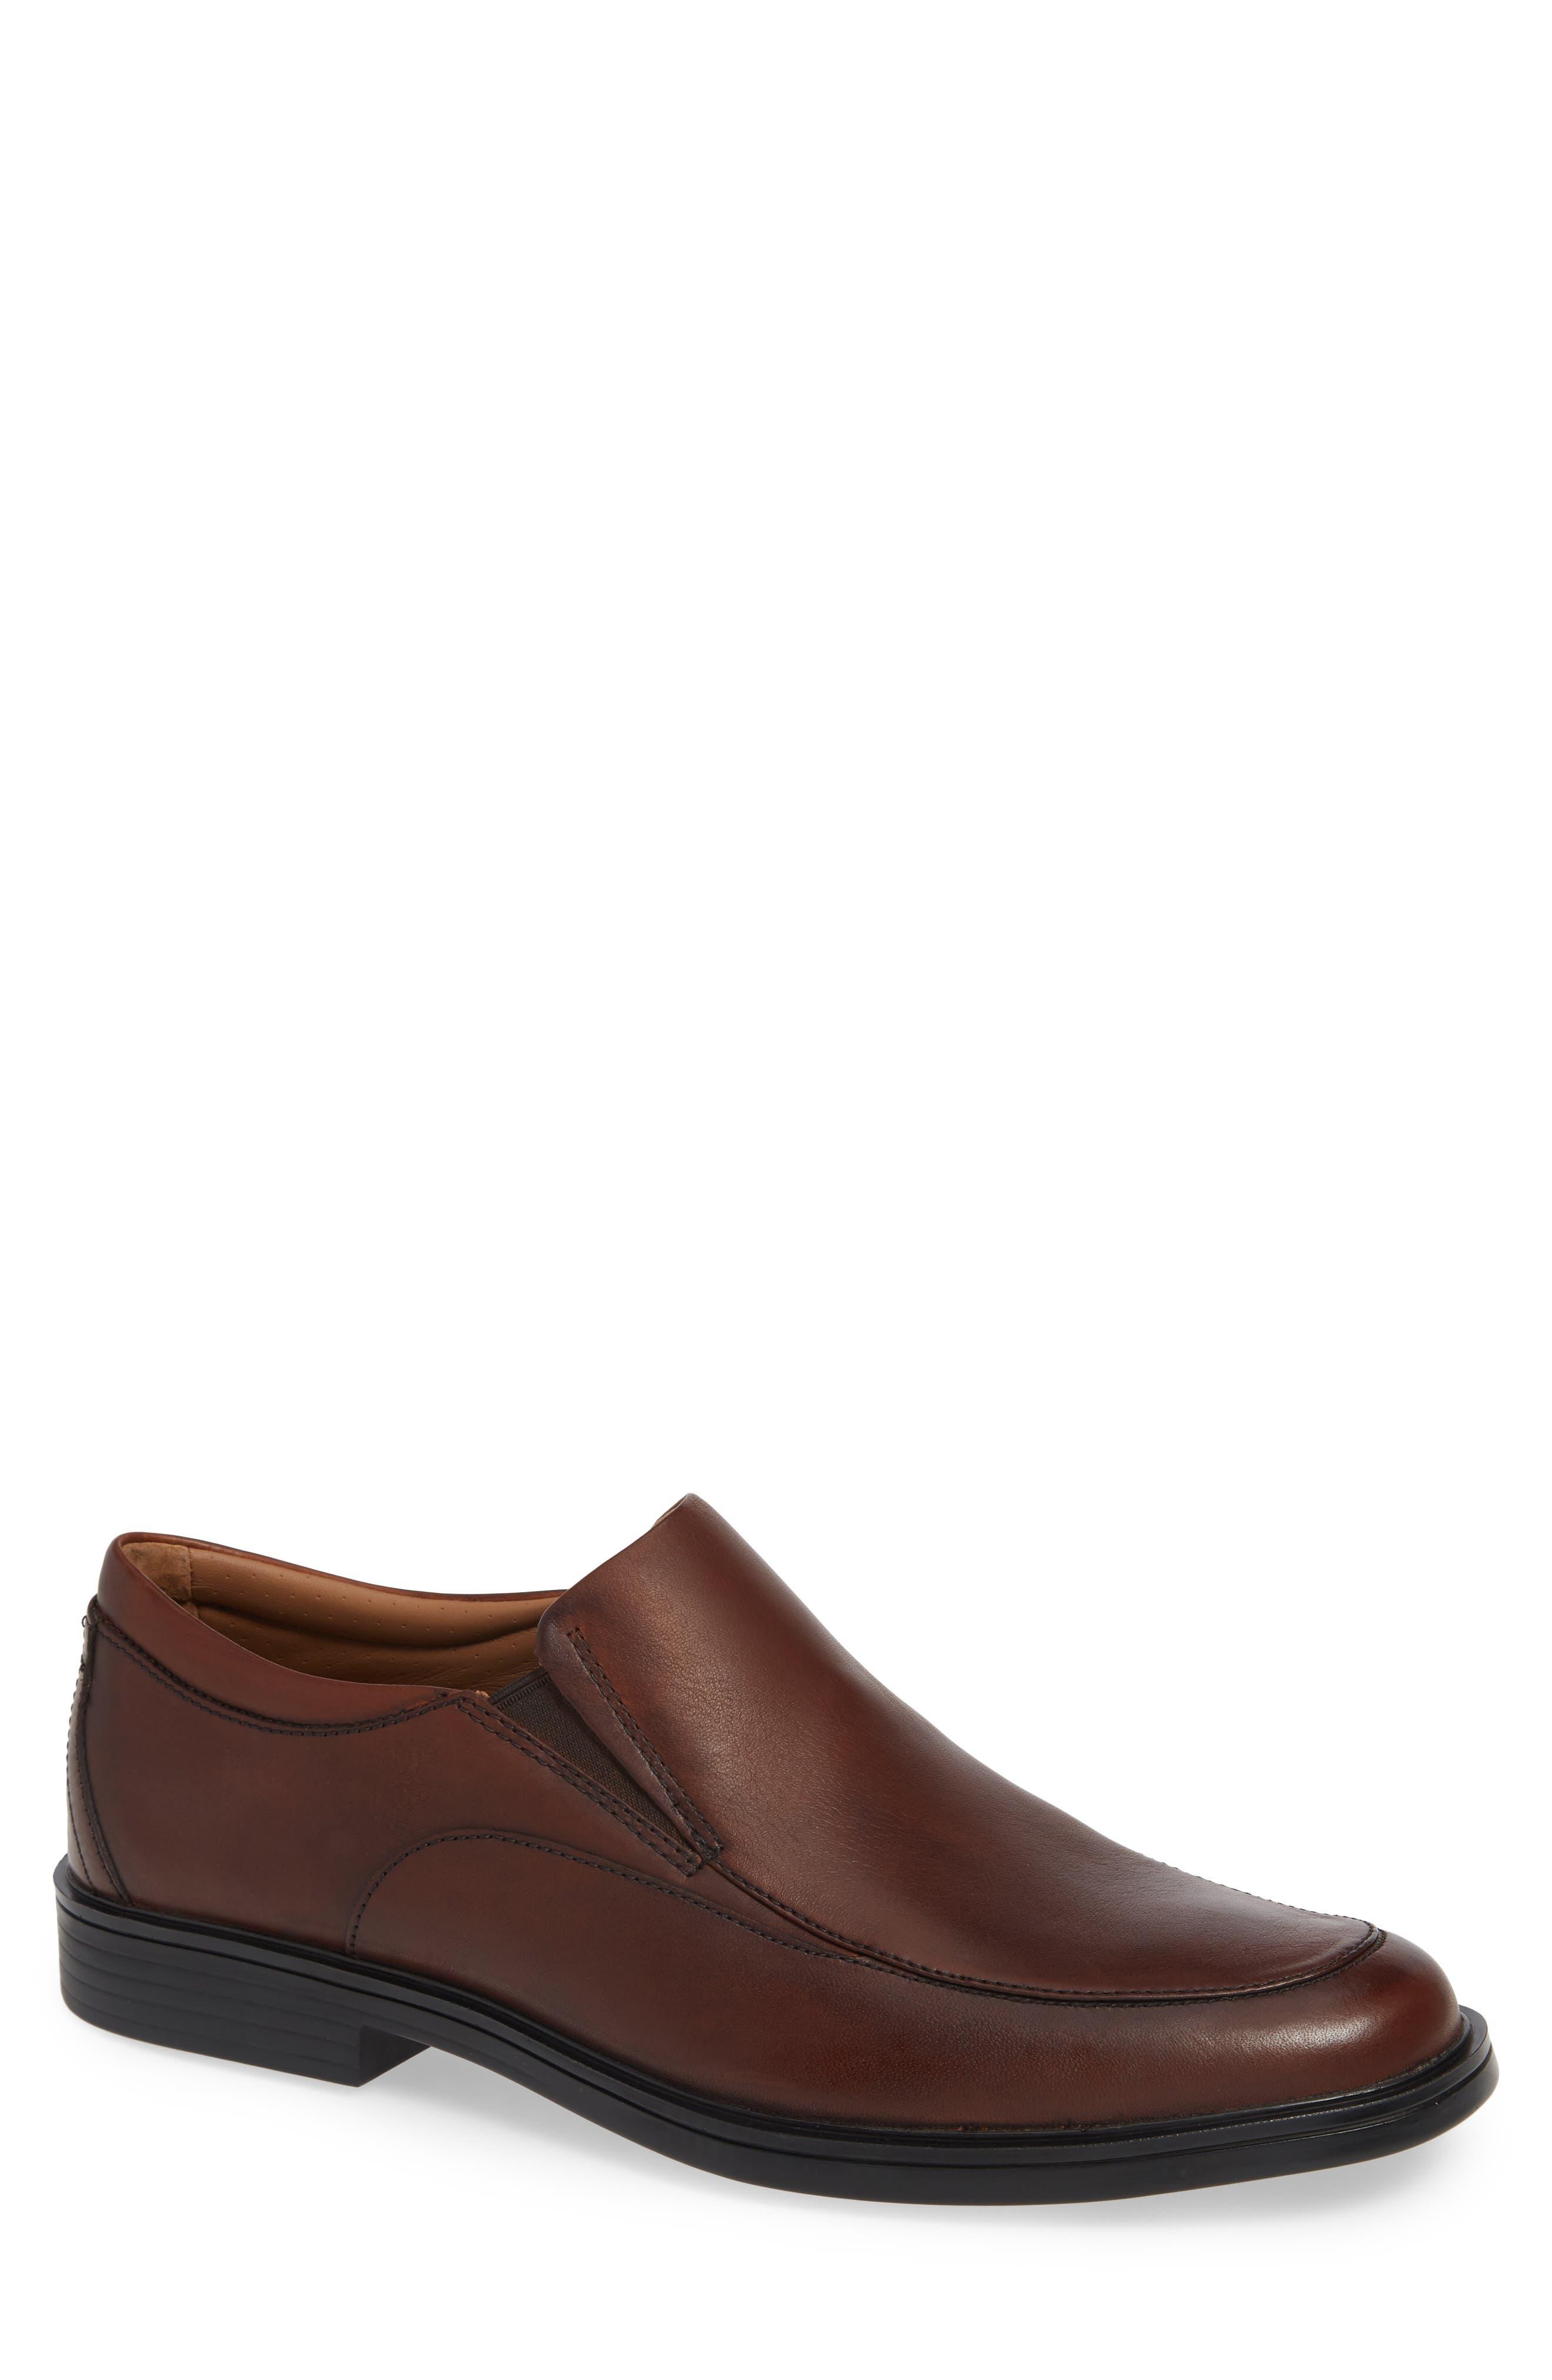 Men's Clarks Originals Un Alderic Walk Loafer